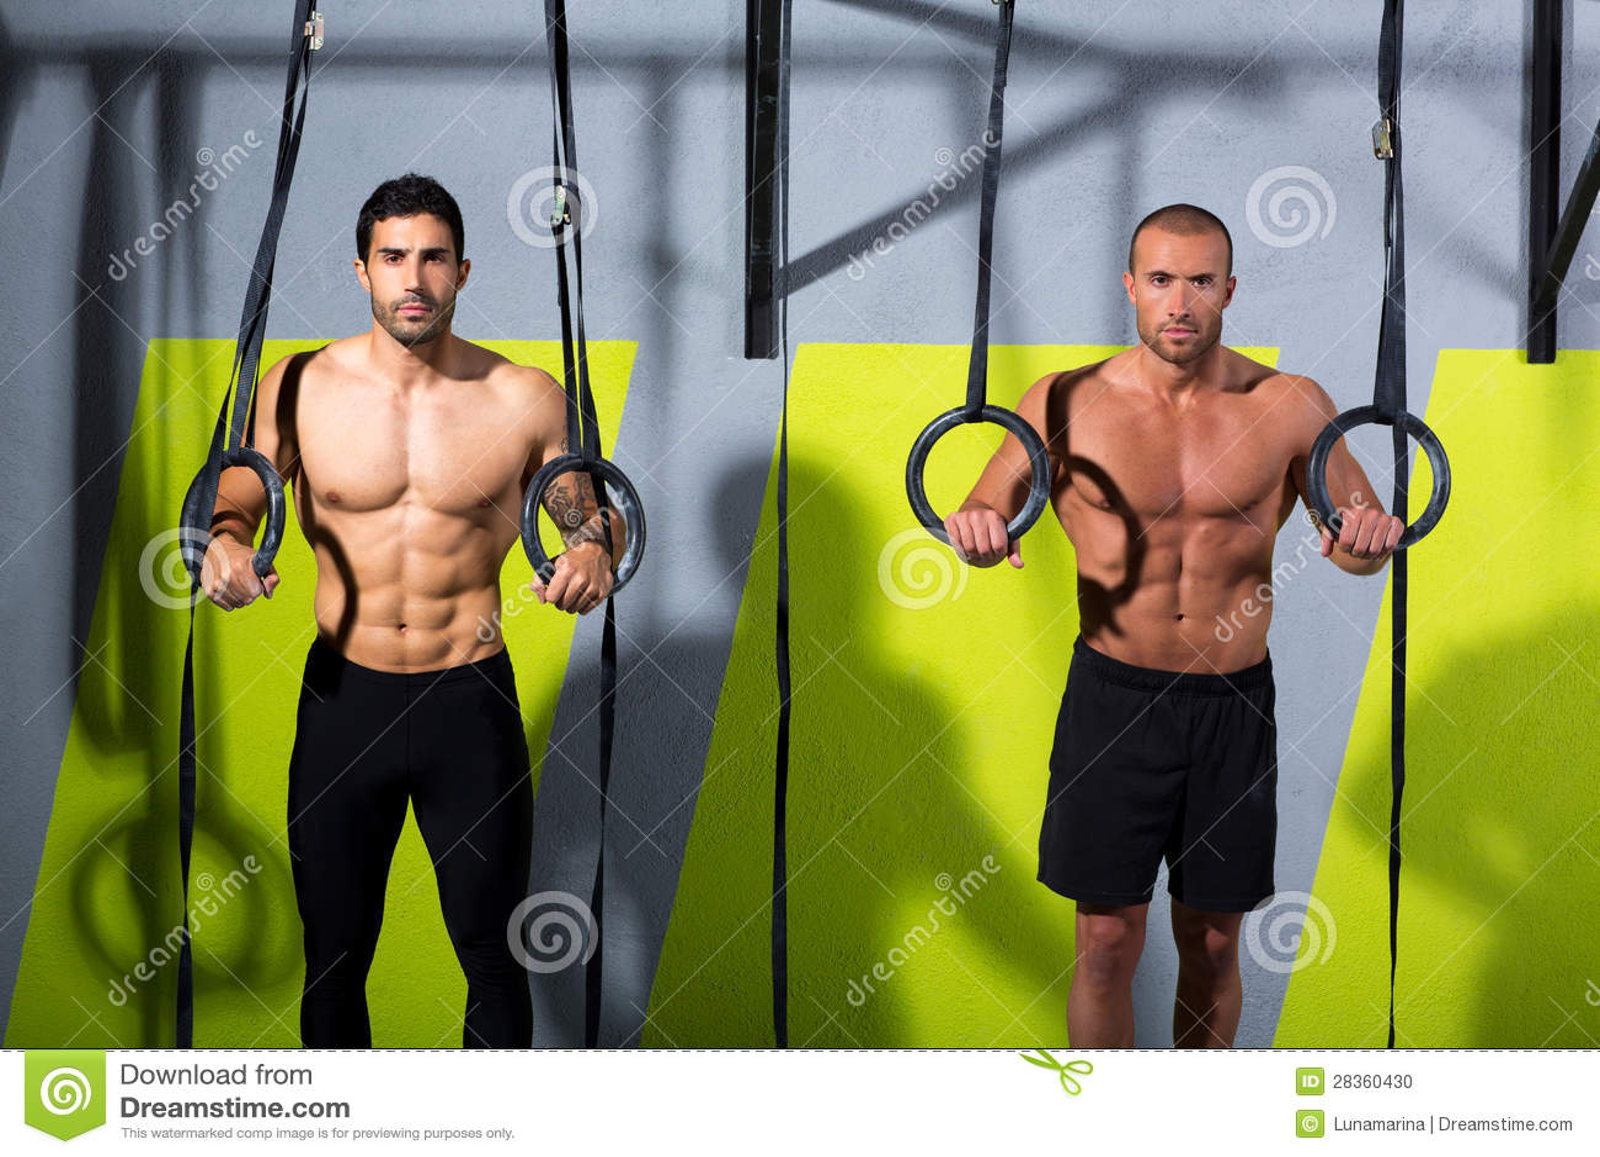 Crossfit Body Vs Bodybuilder Rebarfitness Bodybuilding Was Bringt Mehr Muskelaufbau